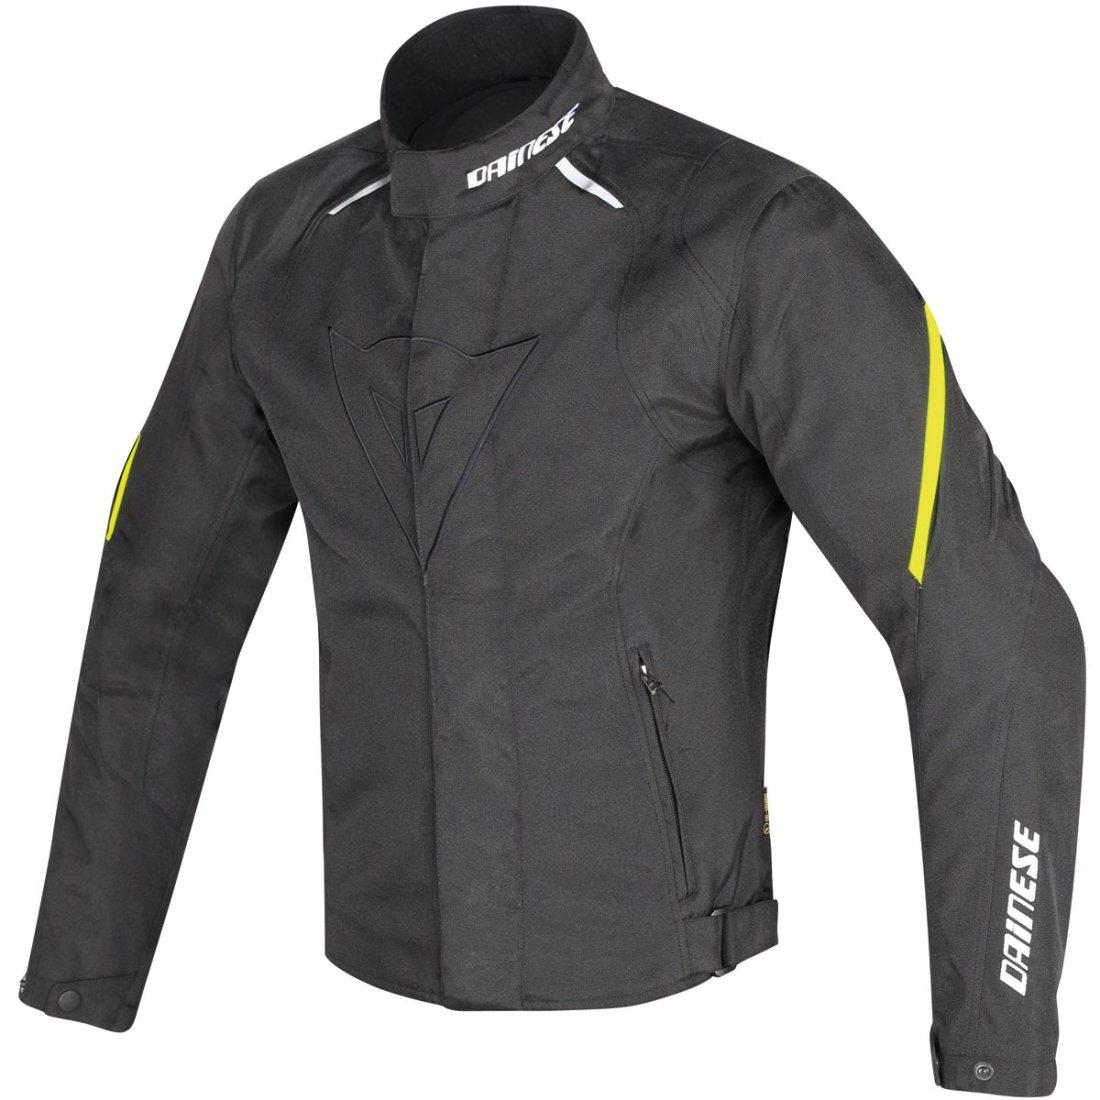 5c07278f16e Chaqueta DAINESE Laguna Seca D1 D-Dry Black   Yellow-Fluo · Motocard